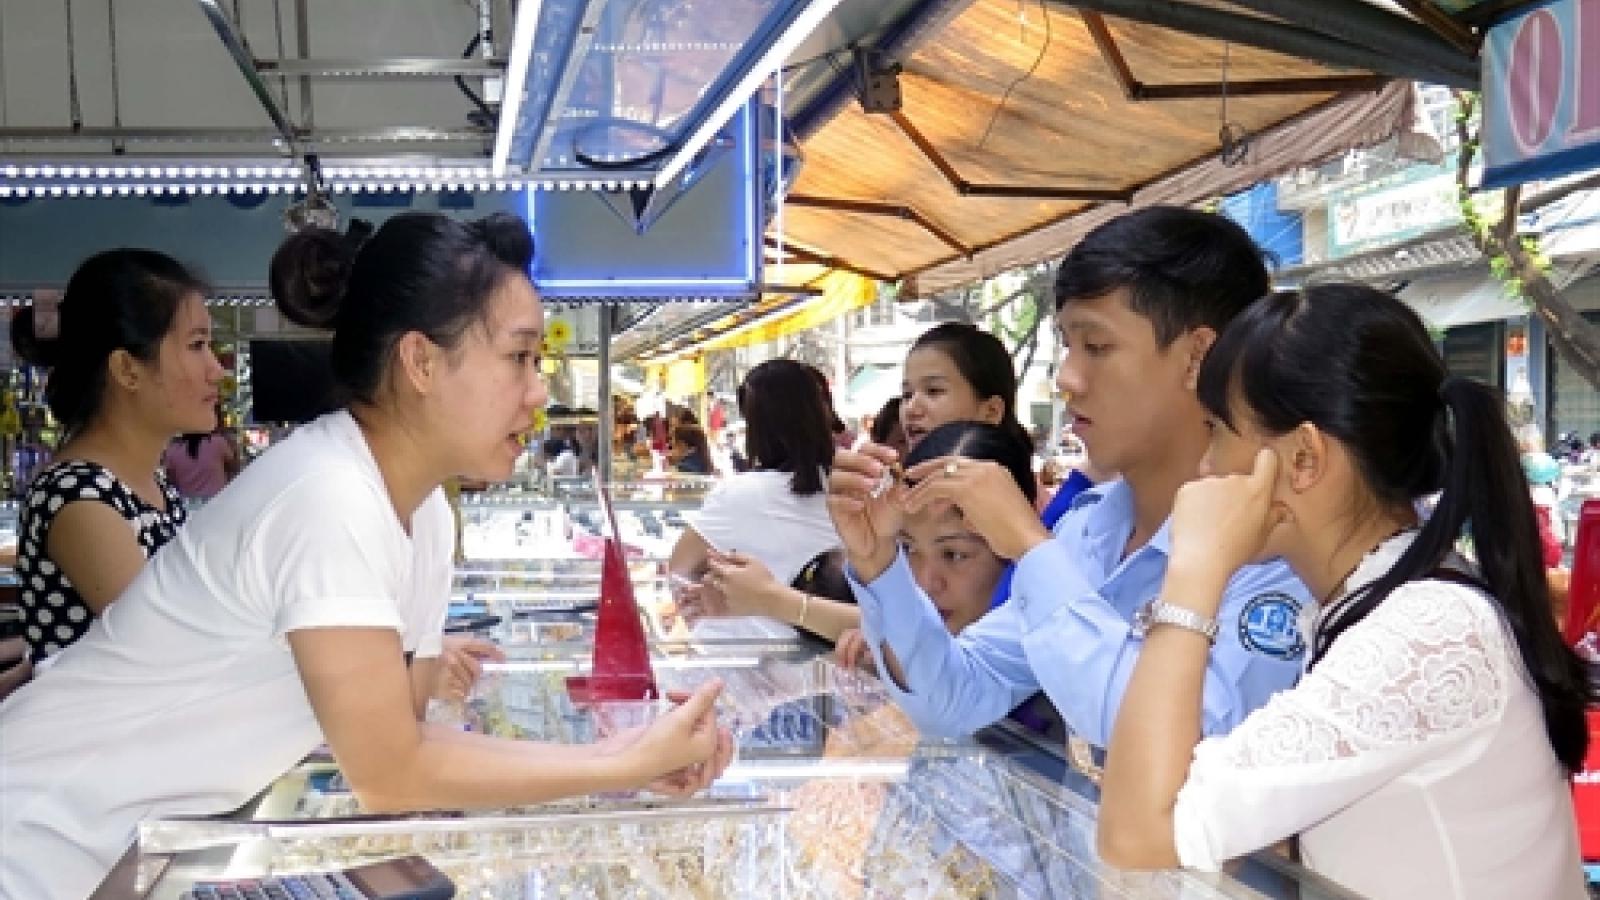 VGTA wants Vietnam to set up gold trading floor